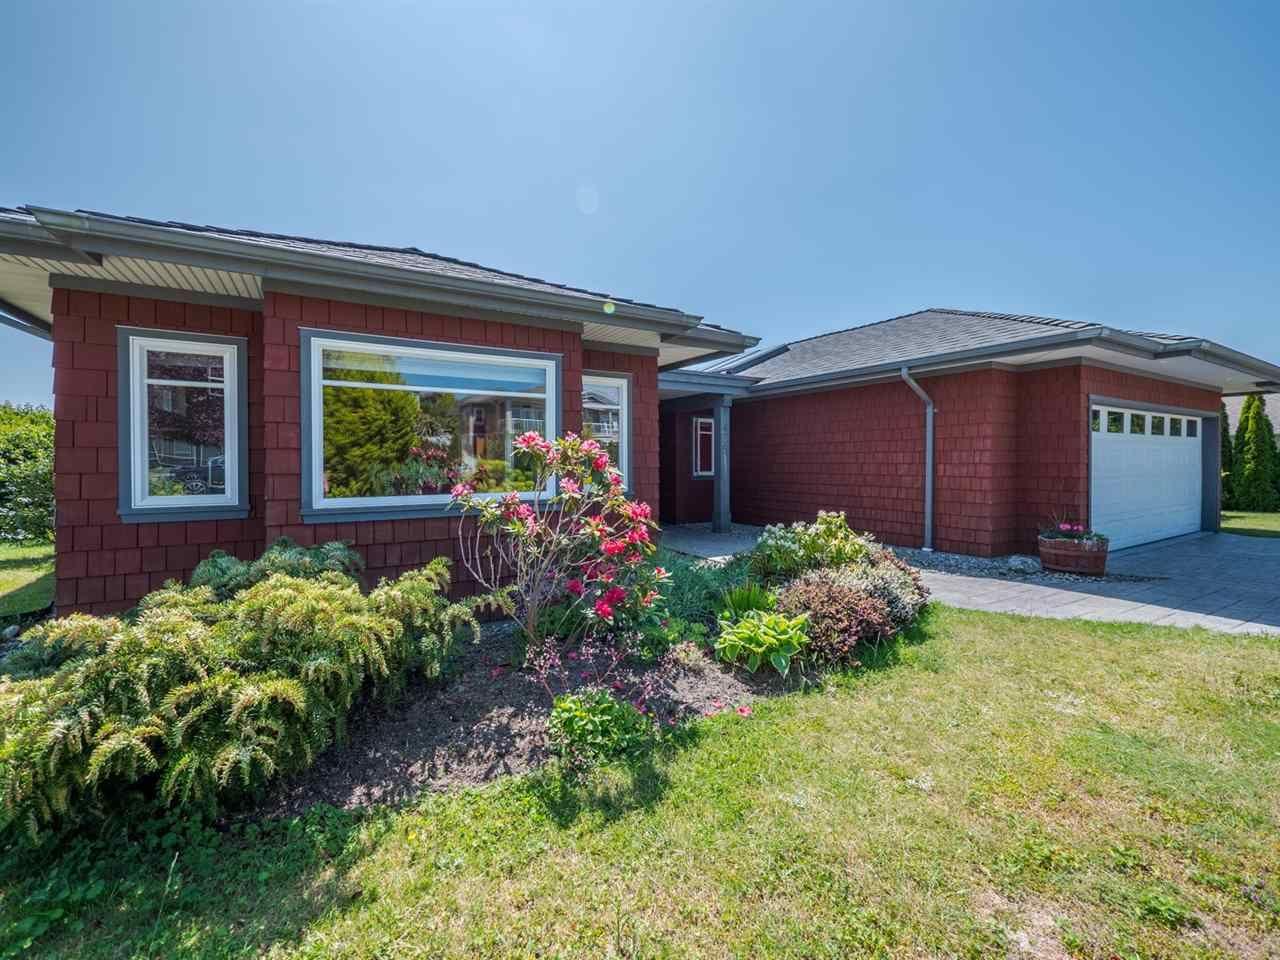 Main Photo: 6223 MIKA Road in Sechelt: Sechelt District House for sale (Sunshine Coast)  : MLS®# R2269567